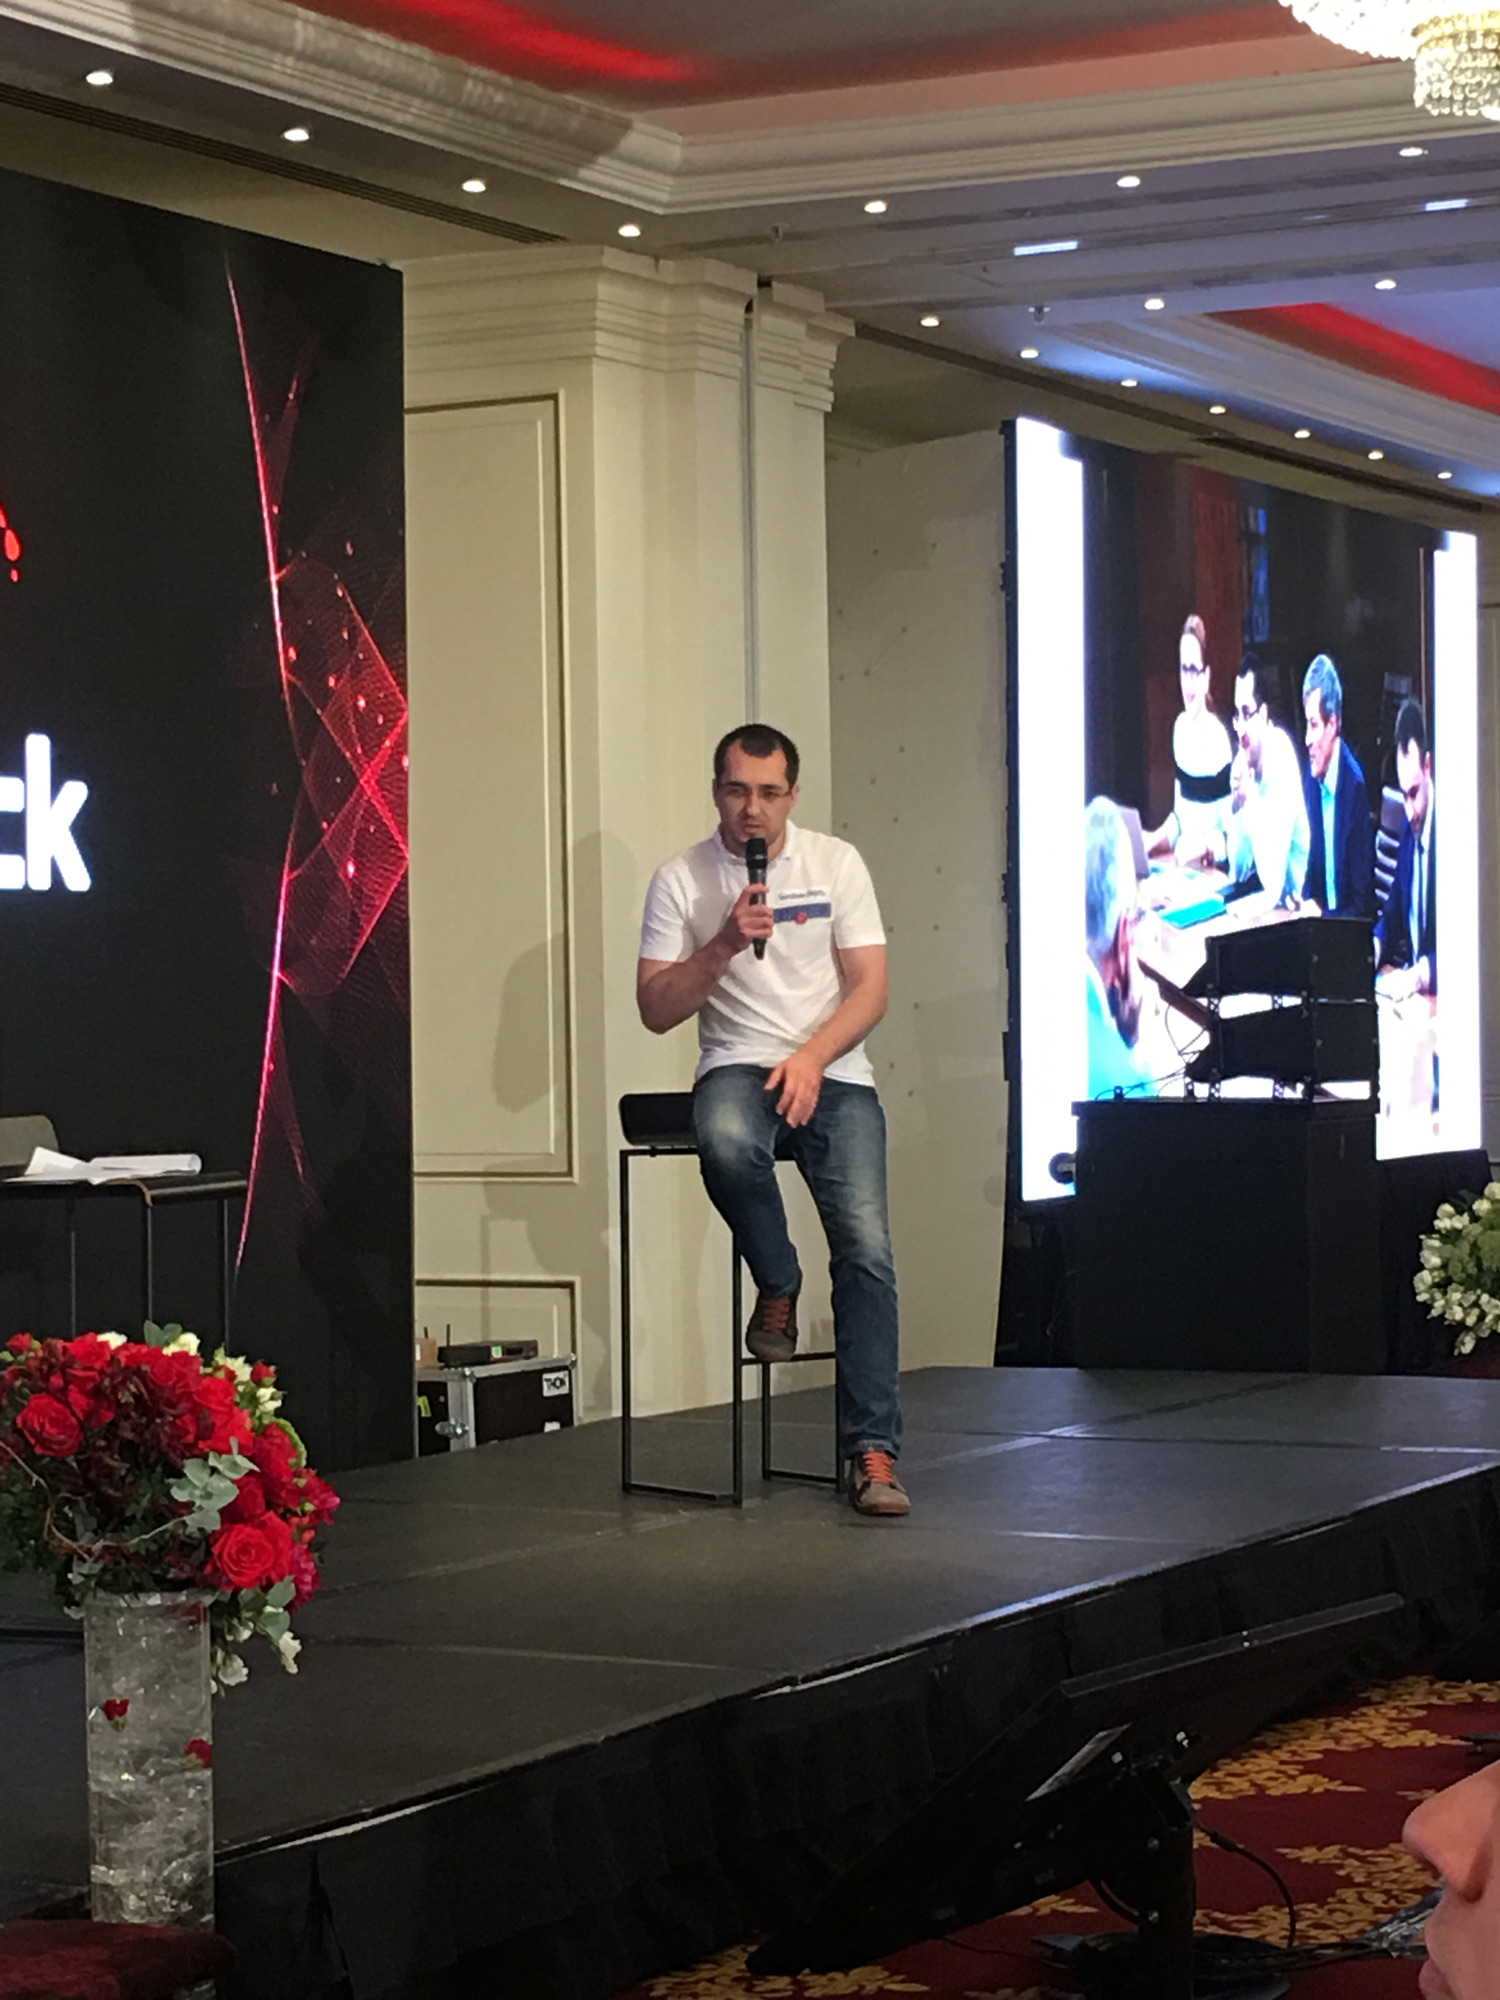 Vlad-VOiculescu-Webstock-2018